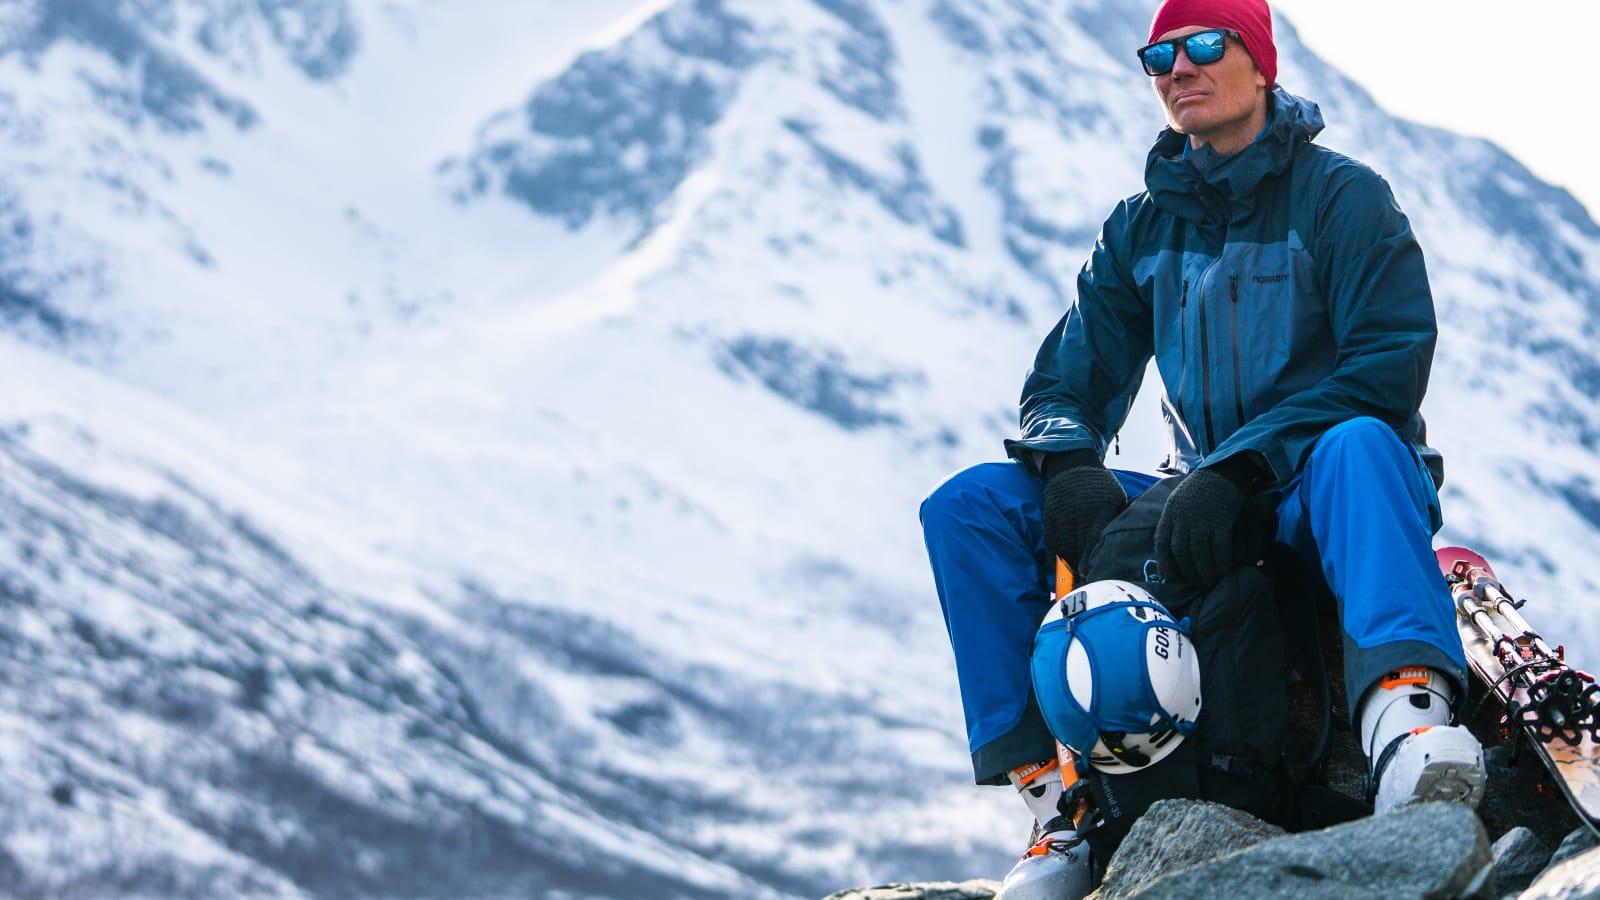 474333c1a Norrona lyngen ski touring collection - Norrøna®